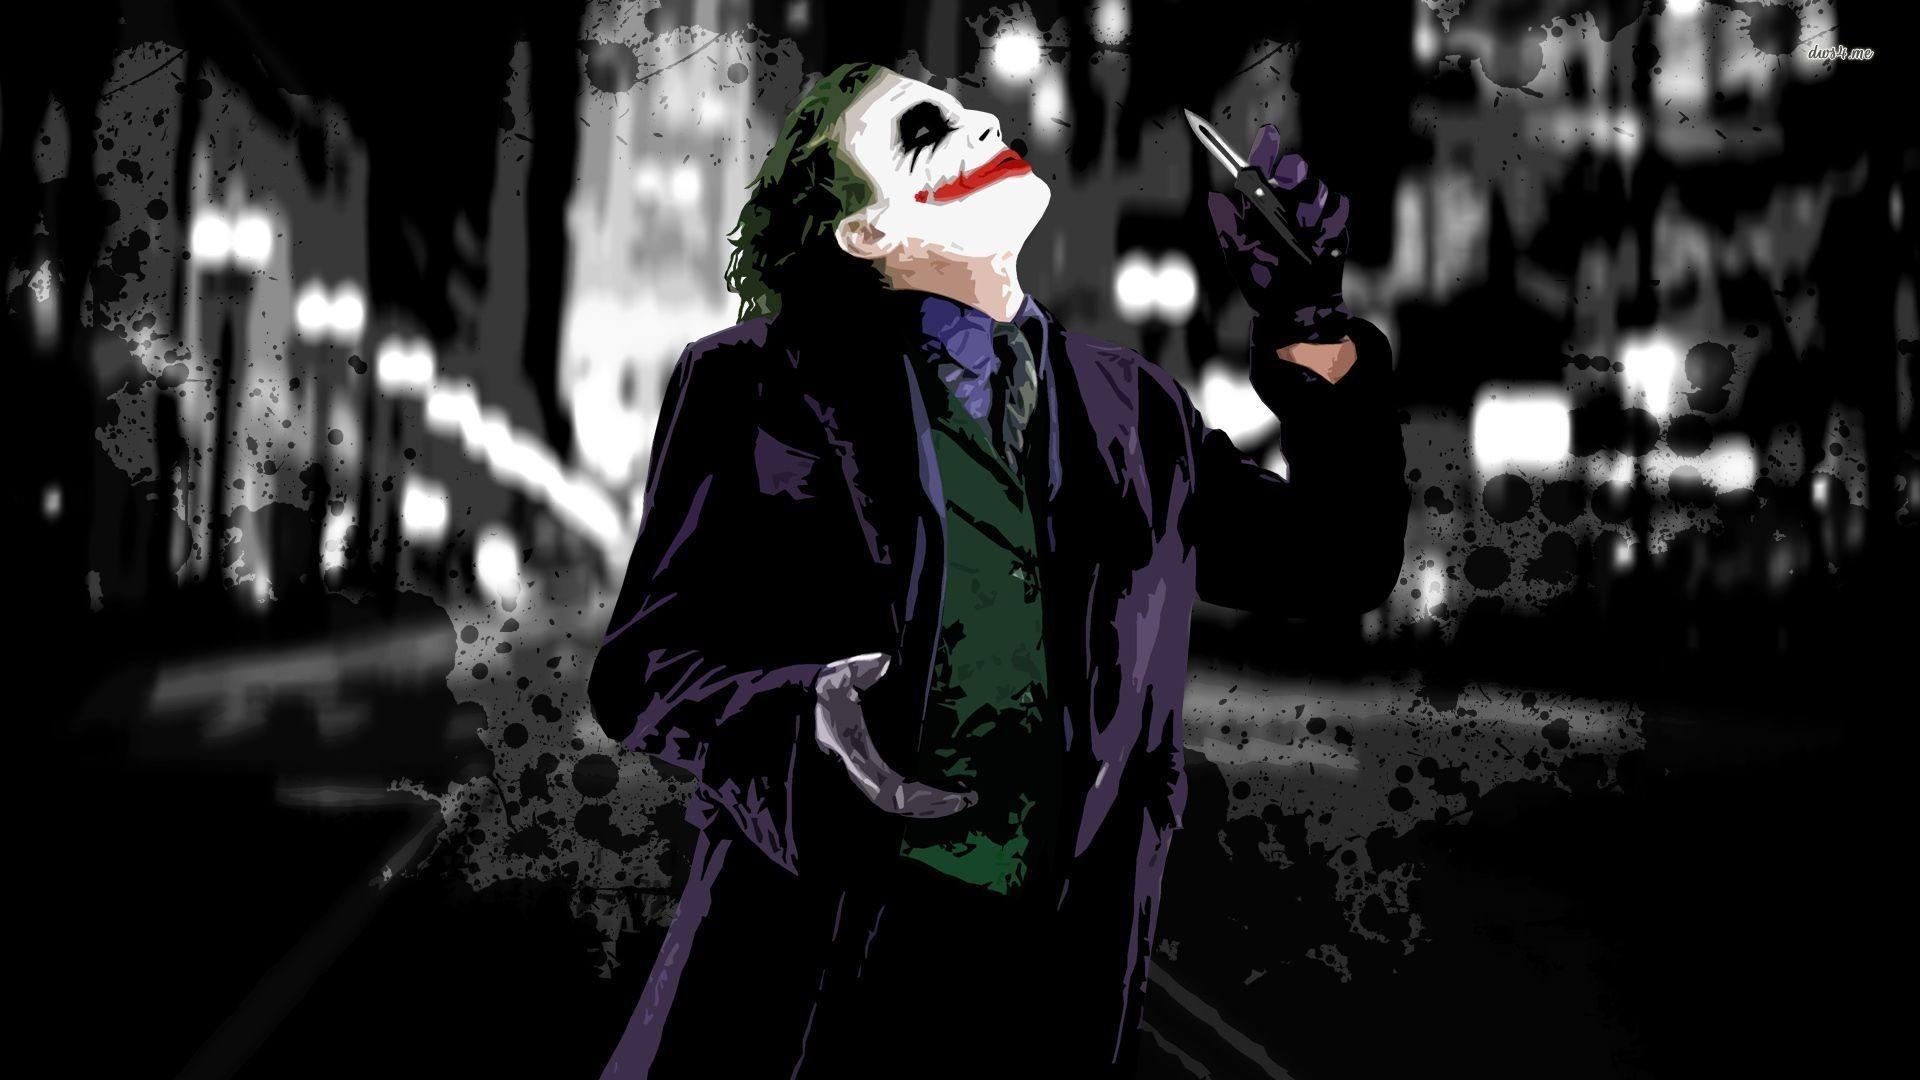 The Joker – The Dark Knight Image In HD 3930 Hd Wallpapers .